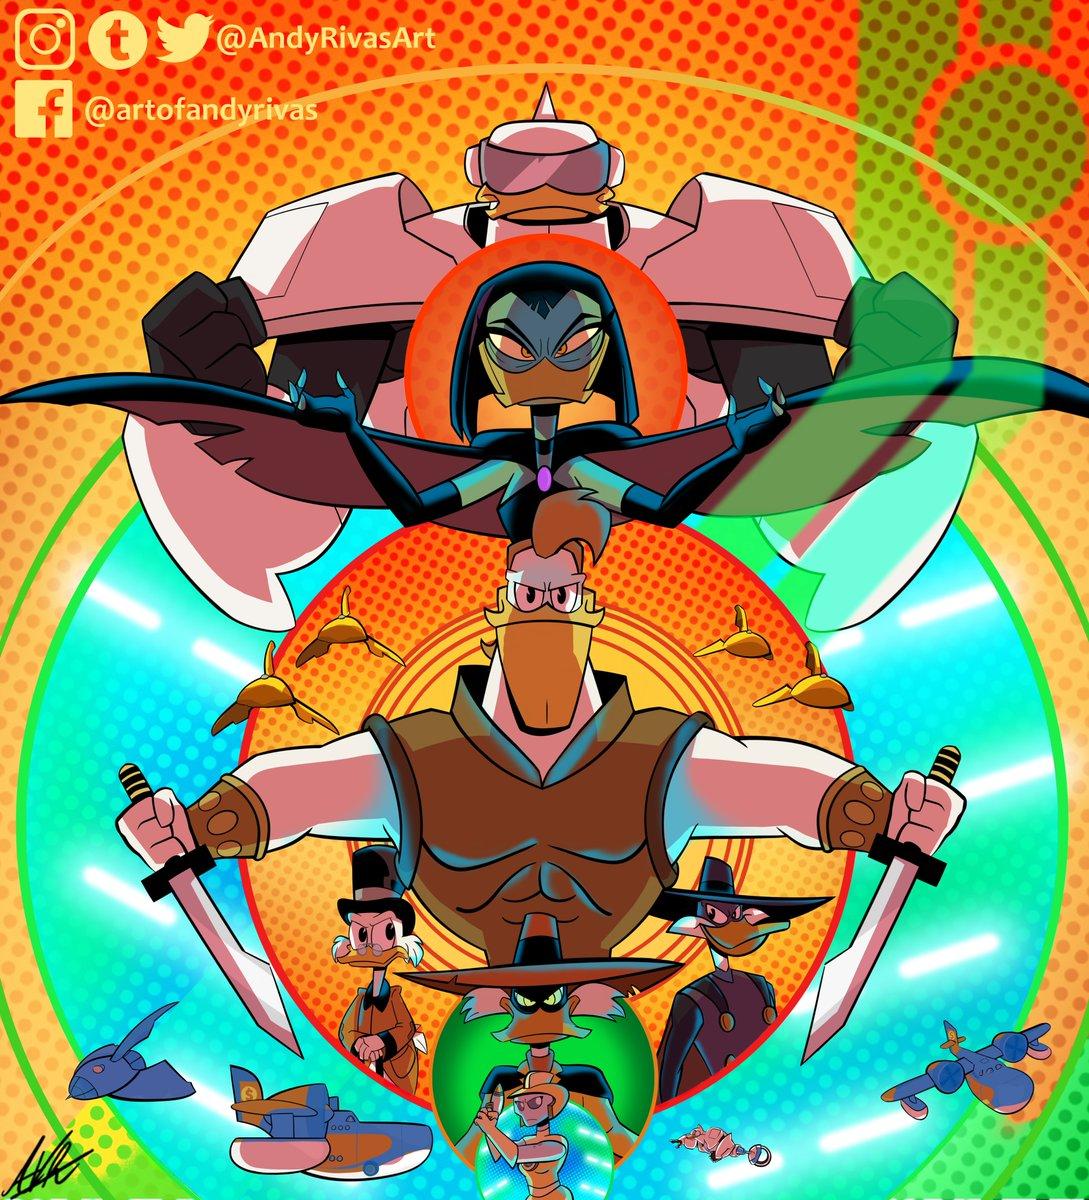 DuckTales Ragnarok…Ragnaduck…Tales?…Ducknarok?… Look, the upcoming episode is called, The Rumble For Ragnarok So here's DuckTales done up Thor Ragnarok style! #ducktalesfanart #ducktales2017 #thorragnarok #MCU #taikawaititi pic.twitter.com/7dP7VW1ygk